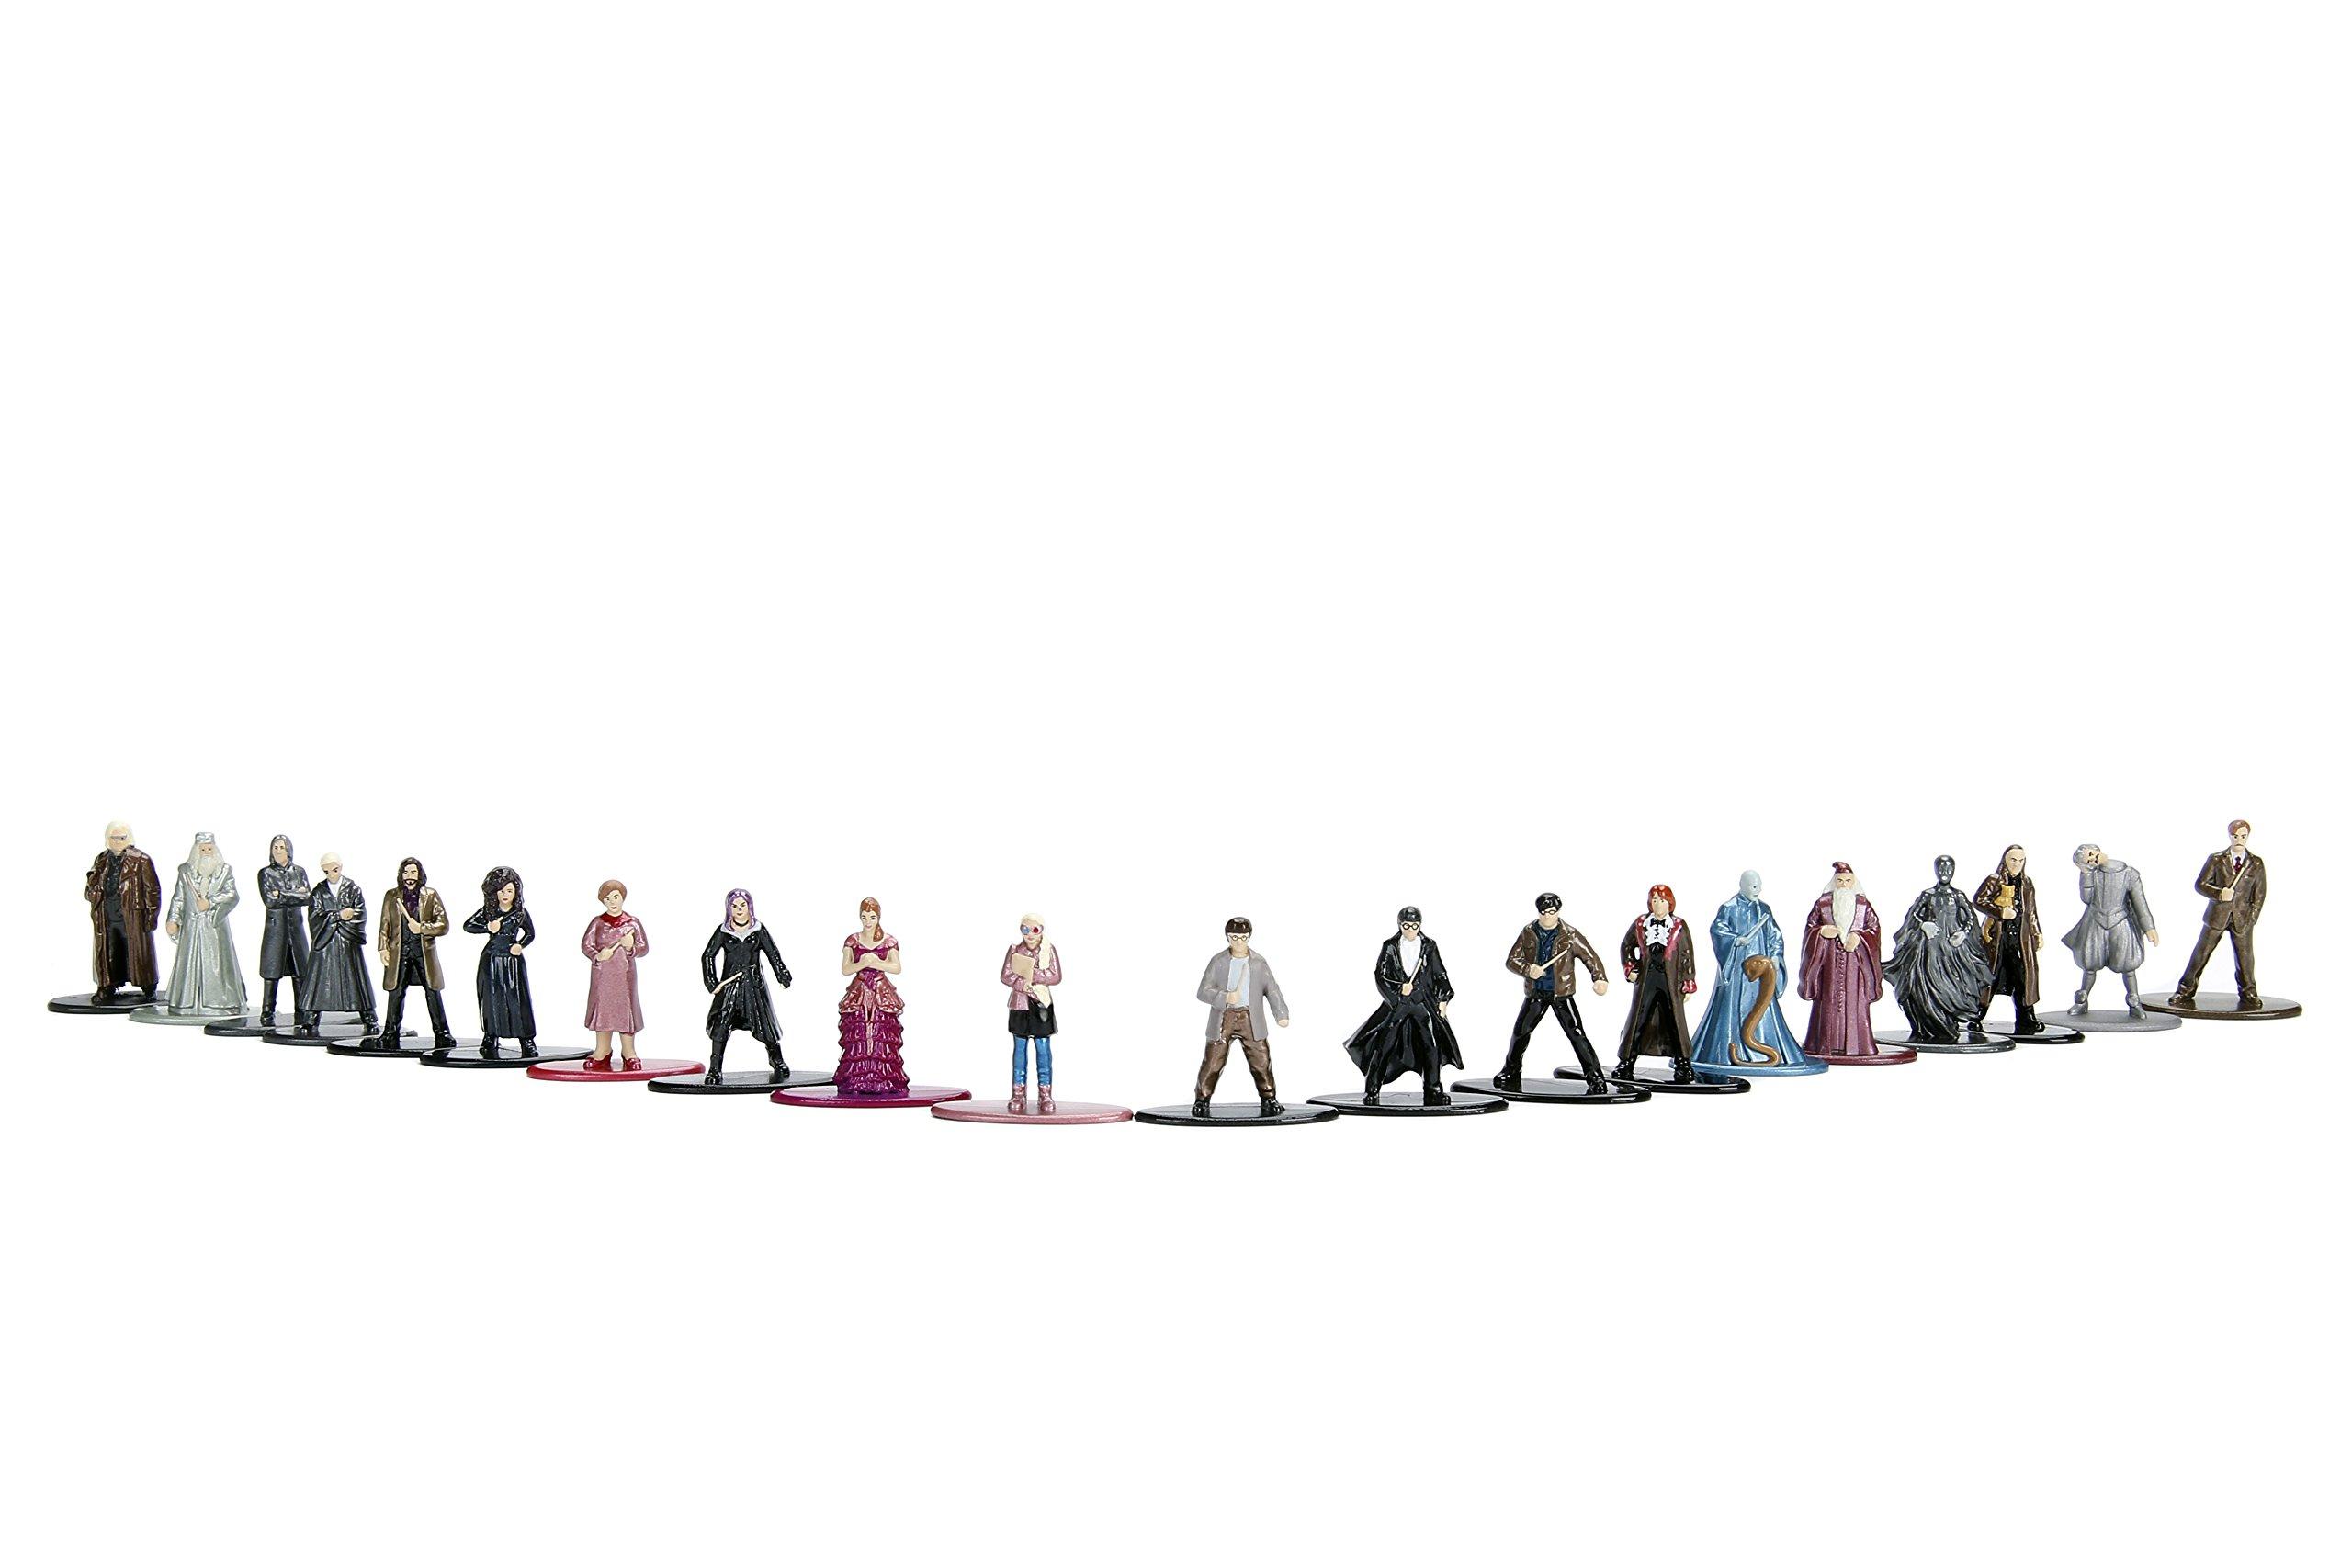 Harry Potter Nano Metalfigs Mini-Figures Wave 2 20-Pack